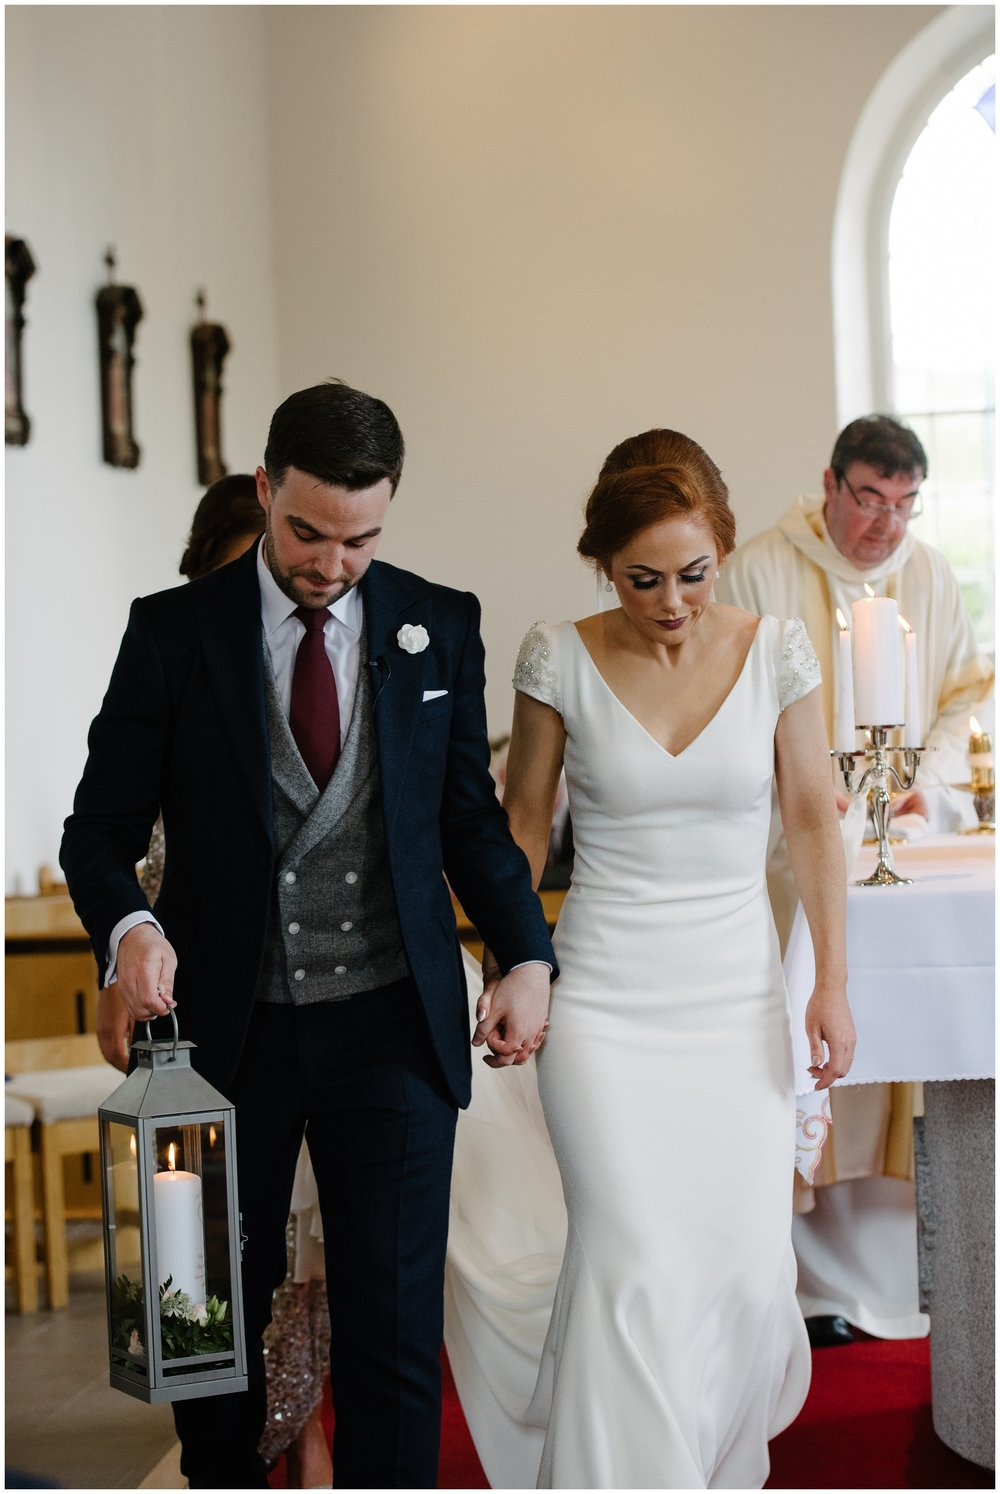 sinead_emmet_farnham_estate_wedding_jude_browne_photography_0072.jpg